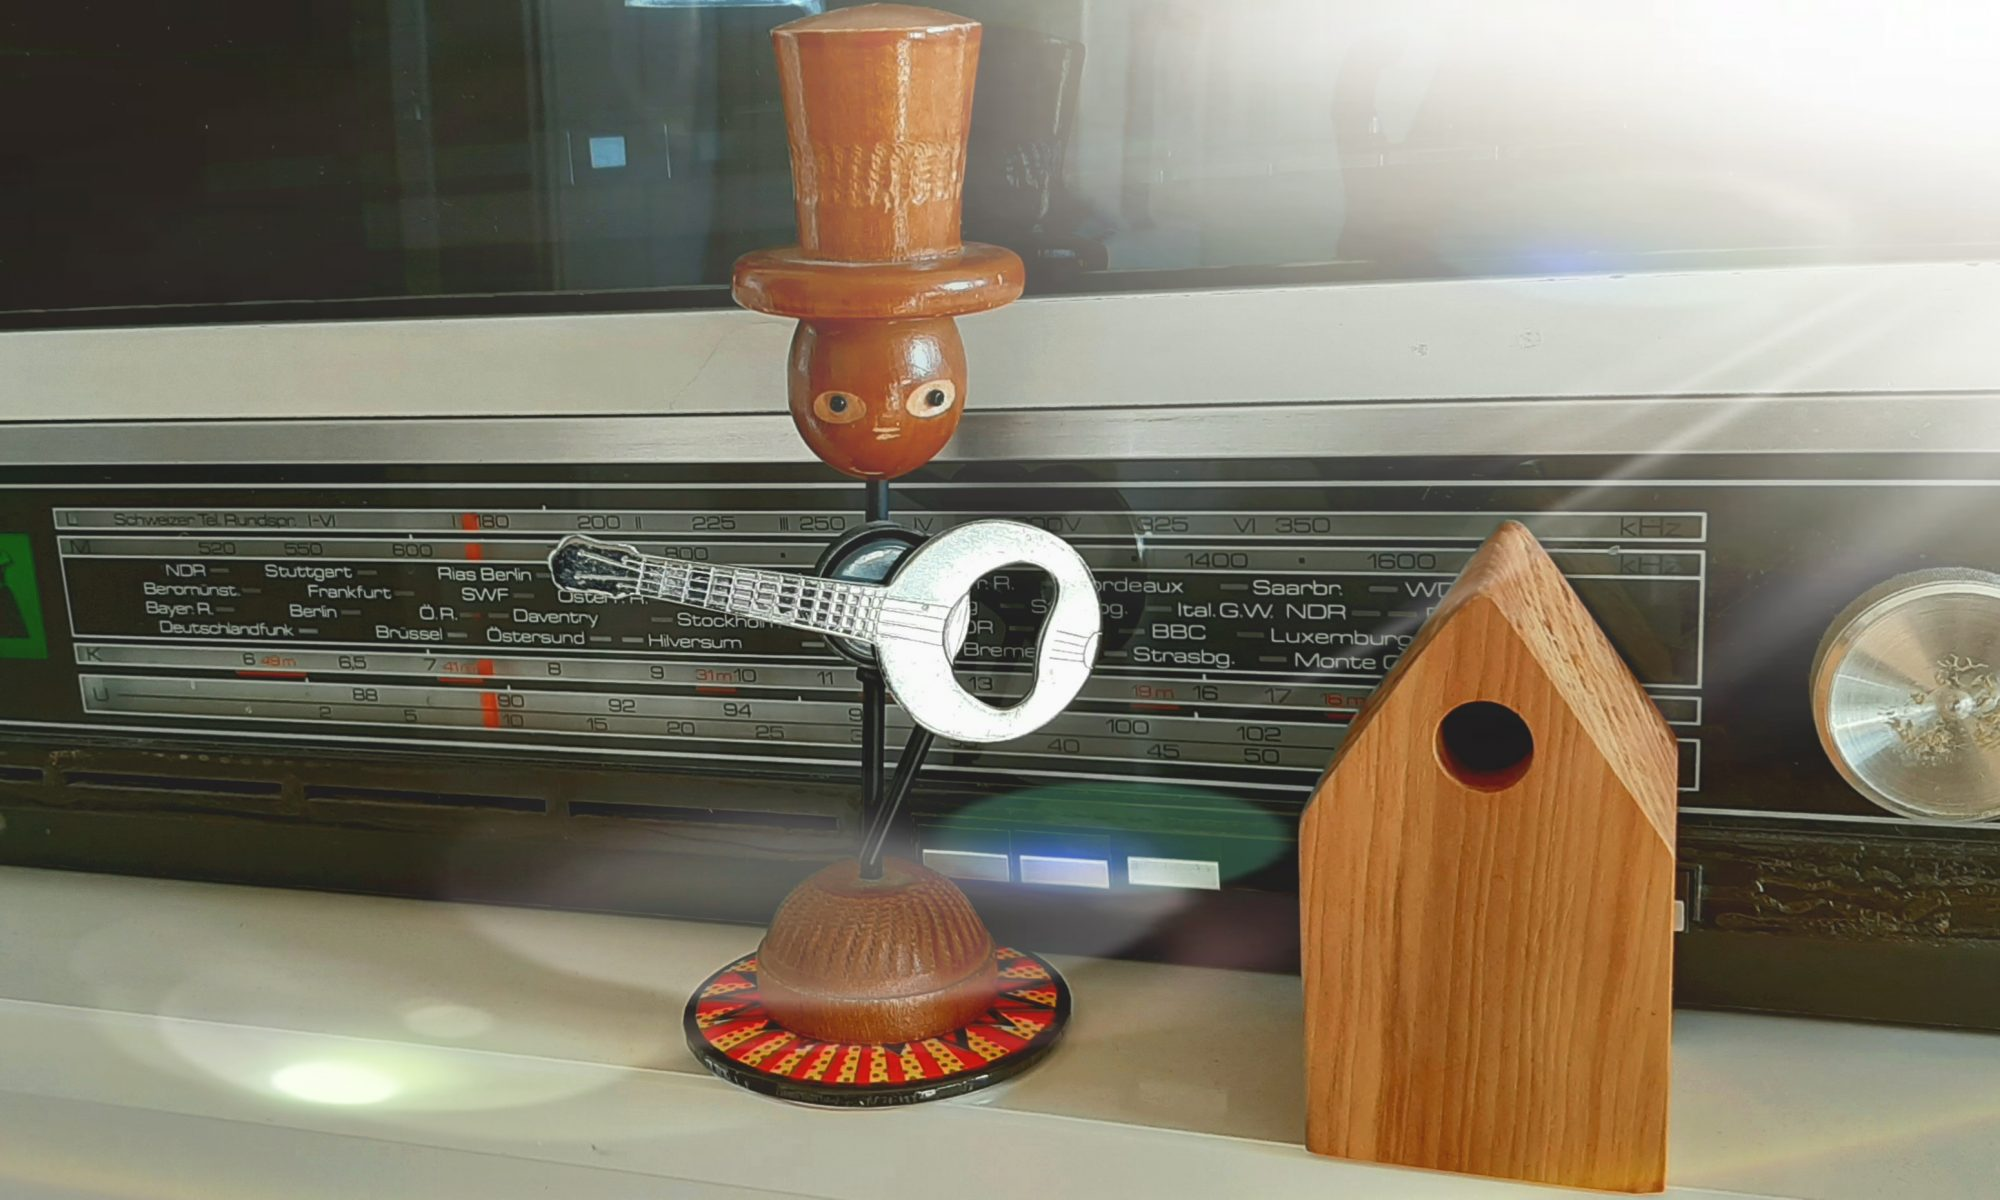 Holzfigur, Gitarre, Mann, Radio, Haus